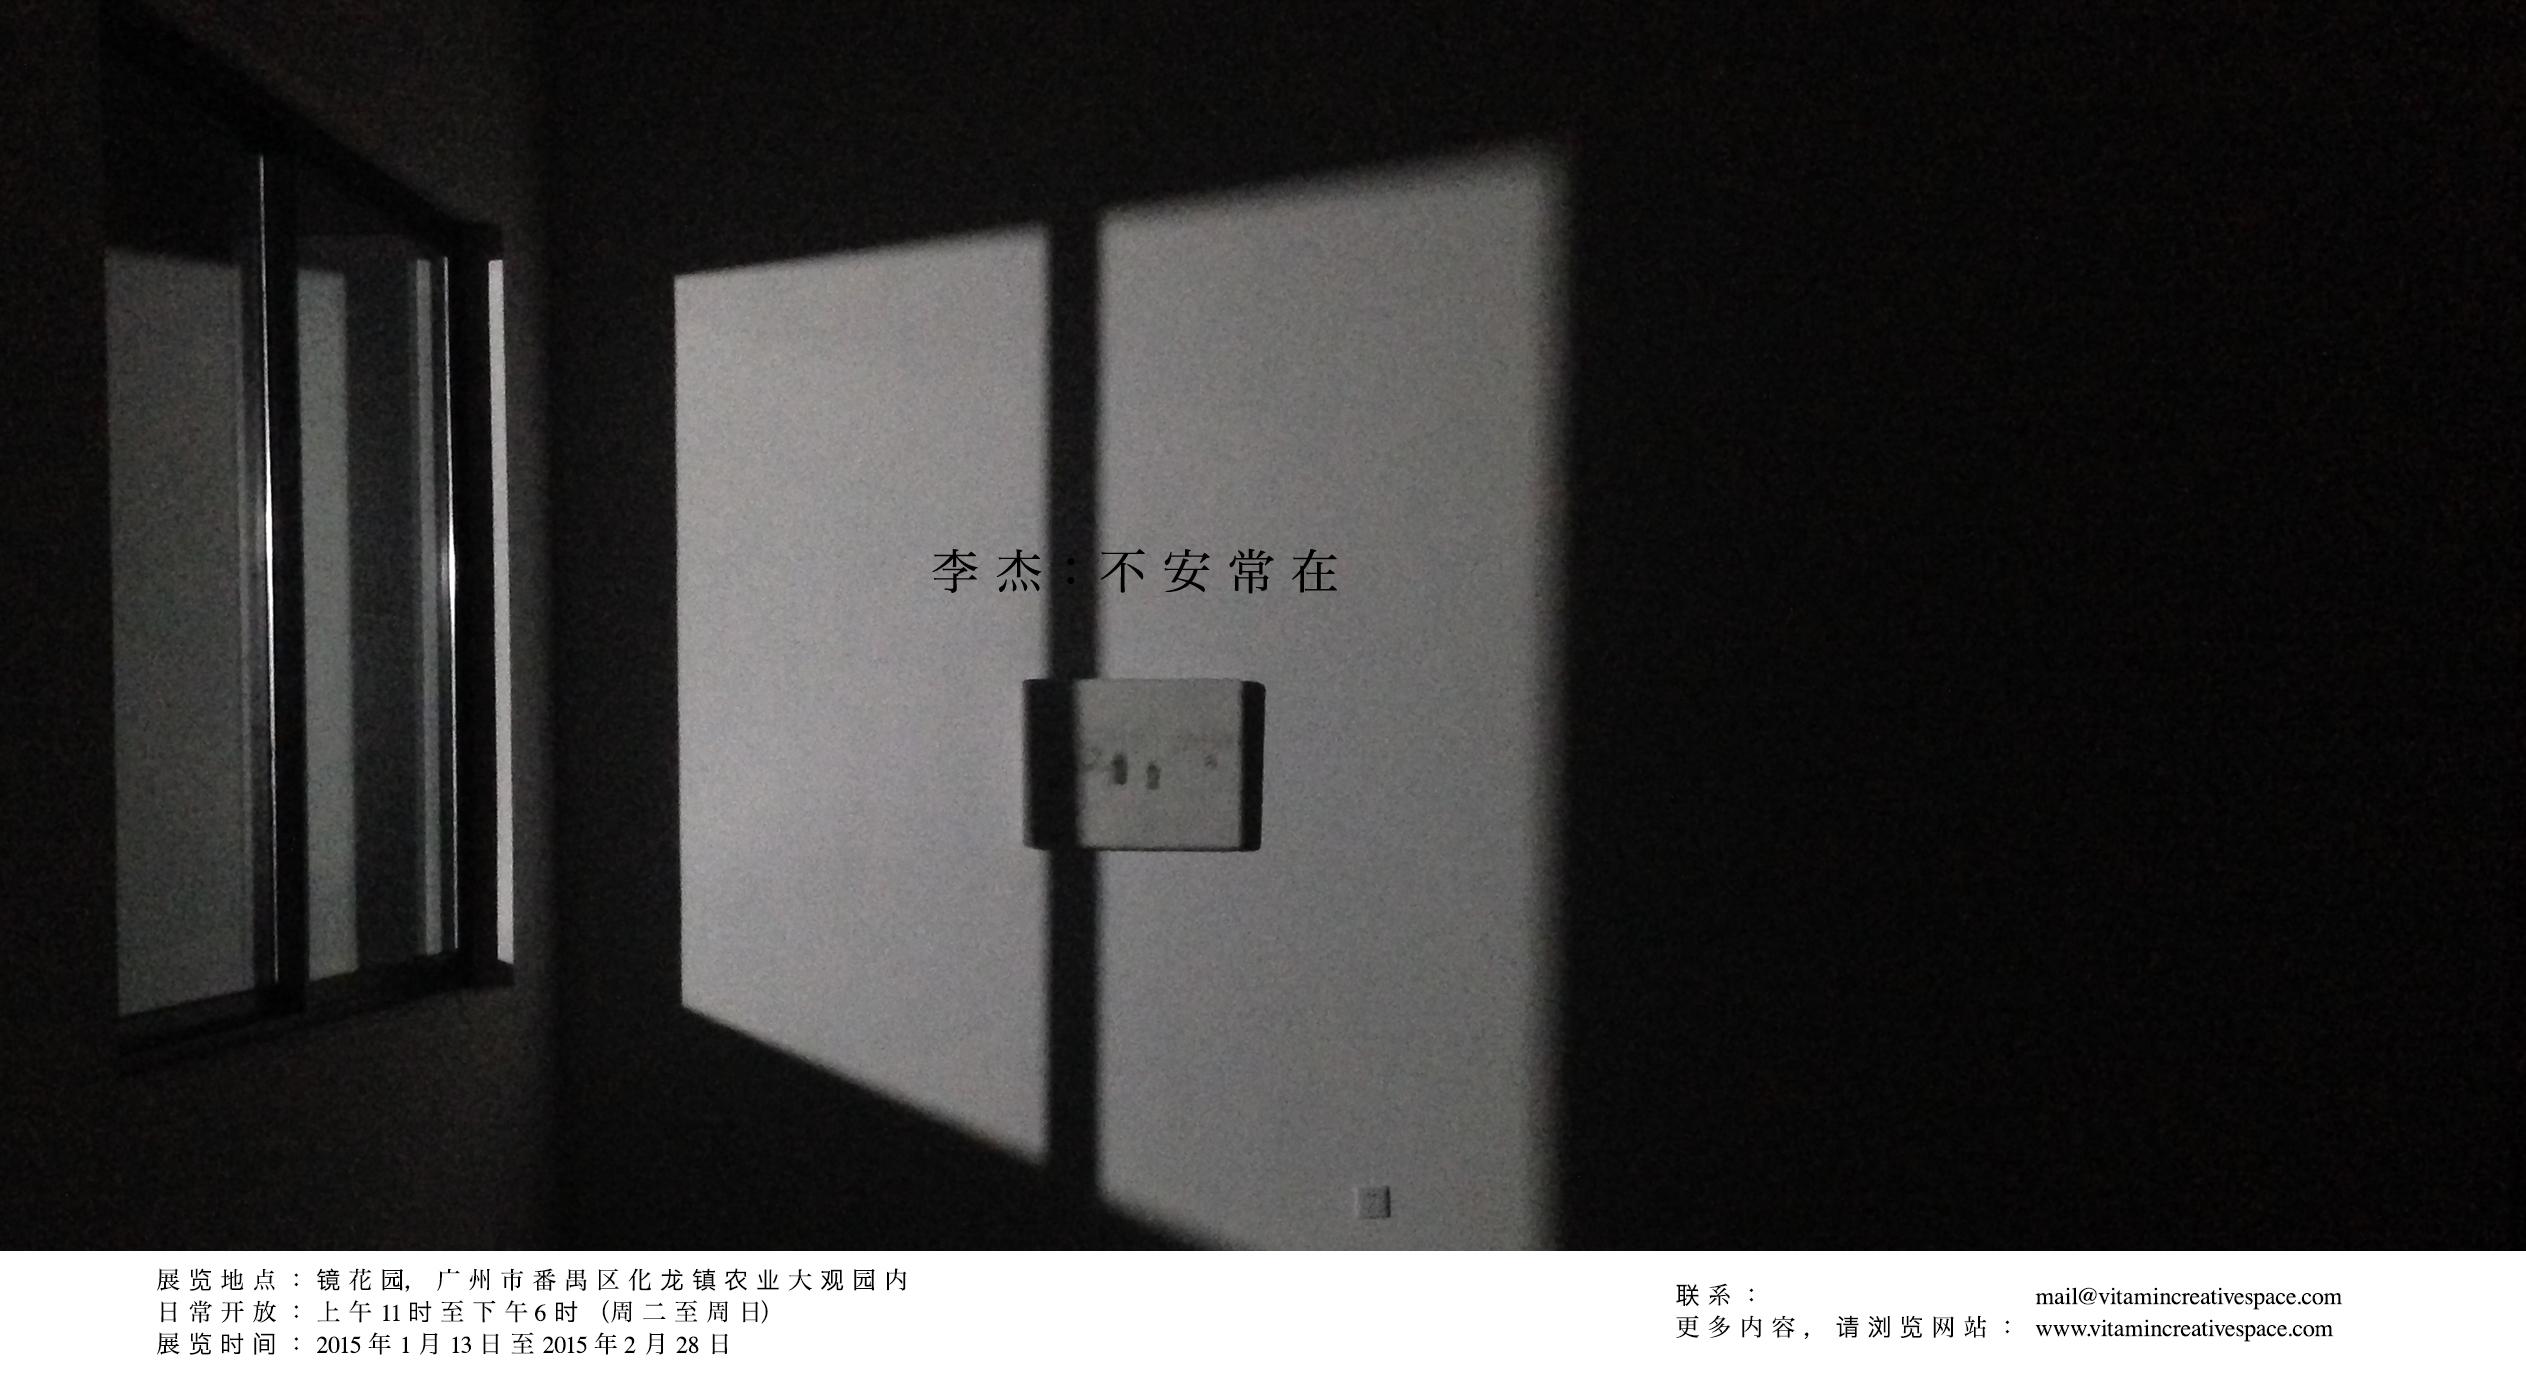 庶民 LK version CN final